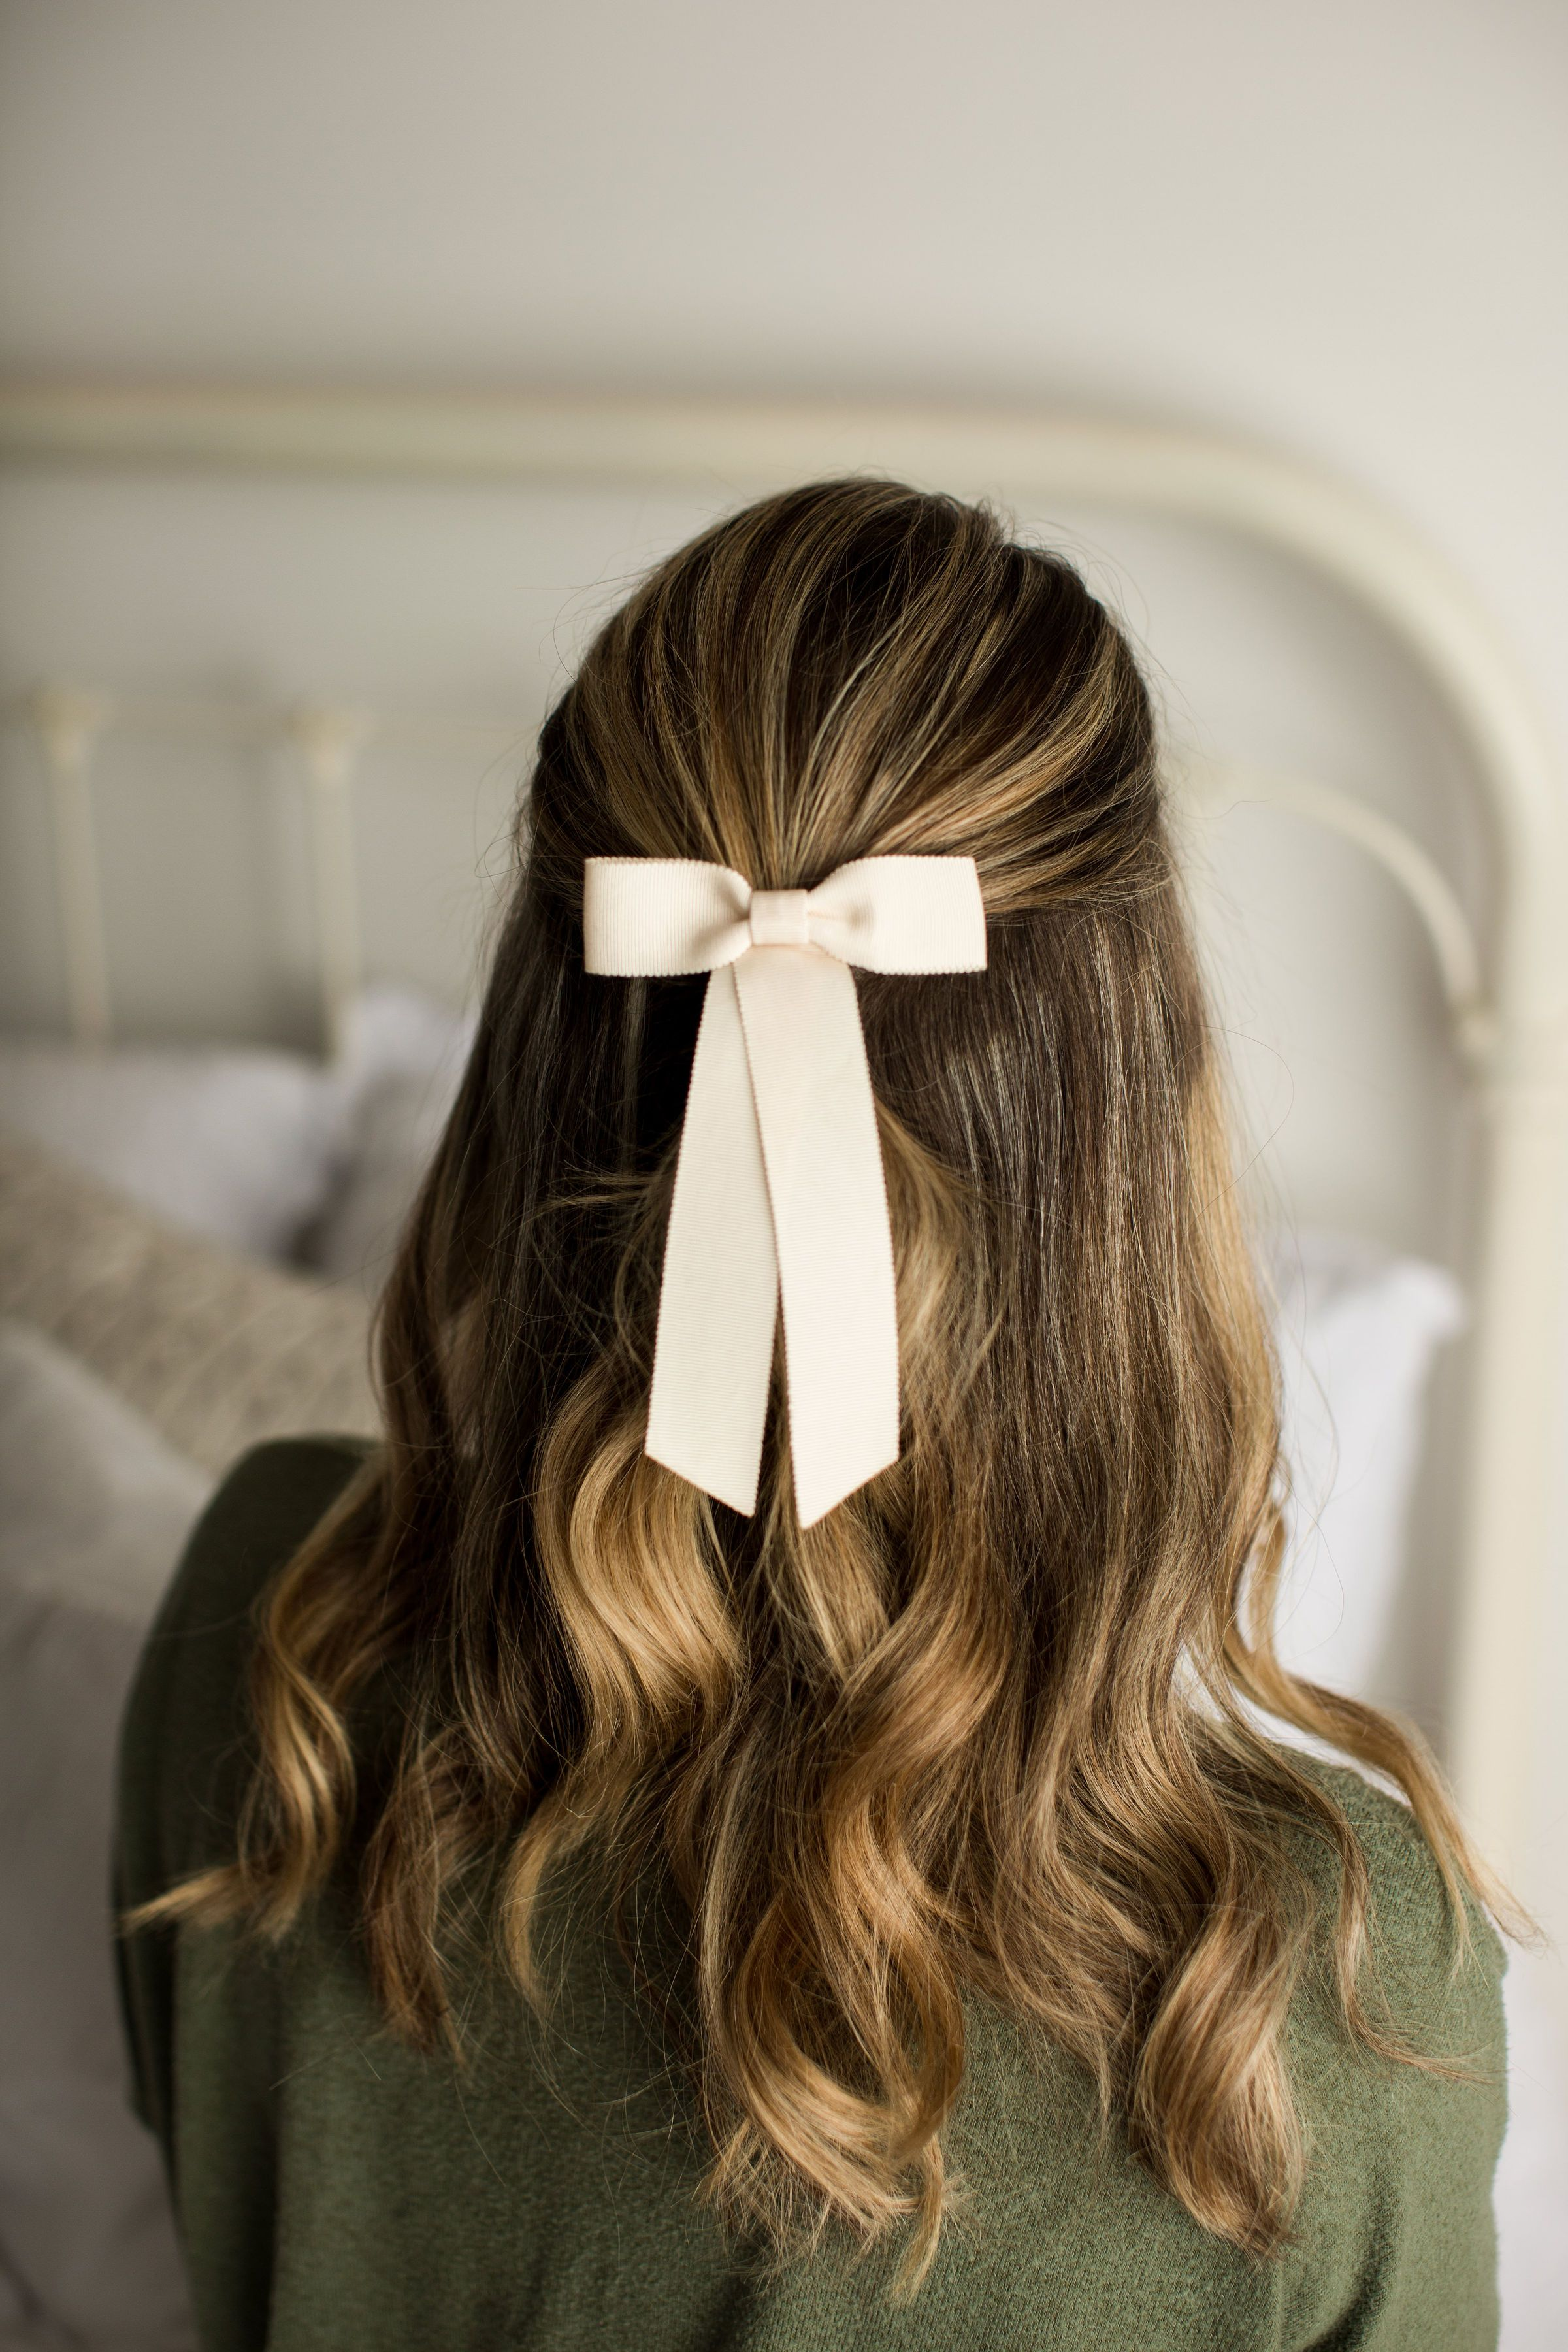 Cute Hair Bows For Adults - Hairstyle ideas